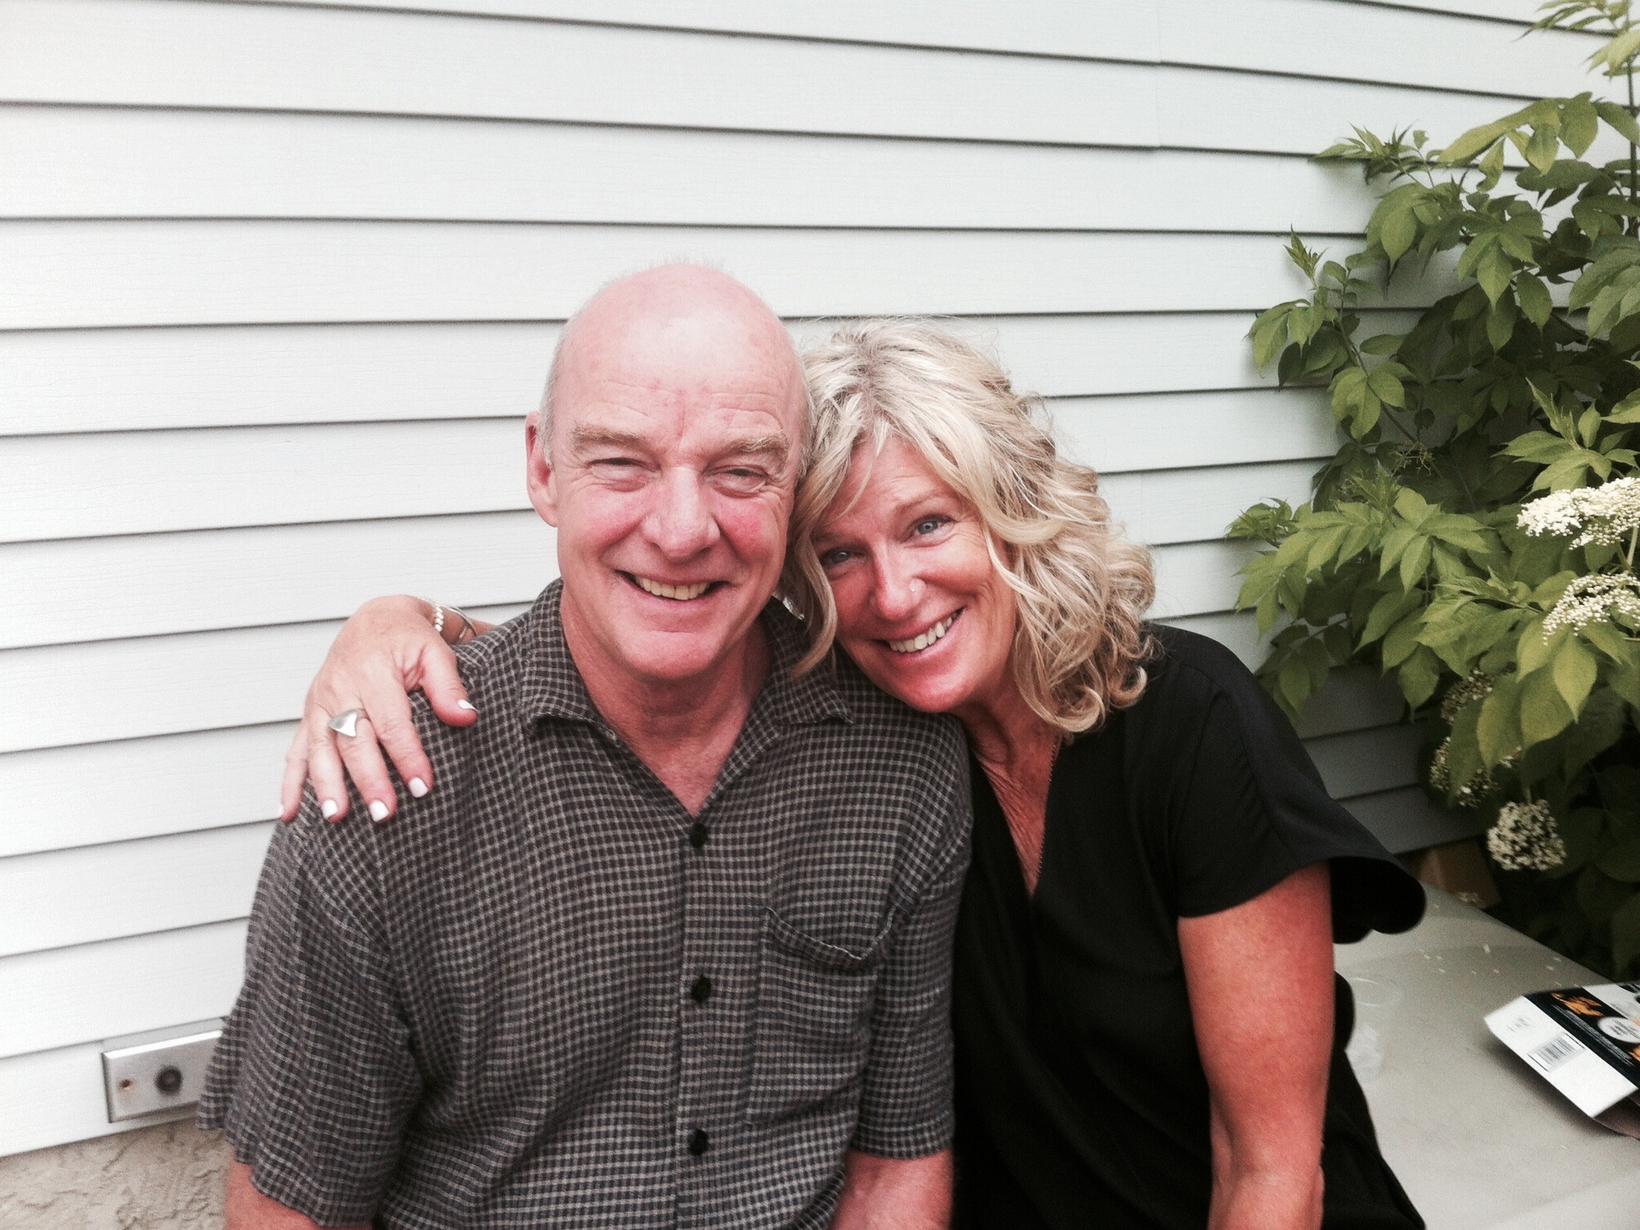 Anne & John from Calgary, Alberta, Canada